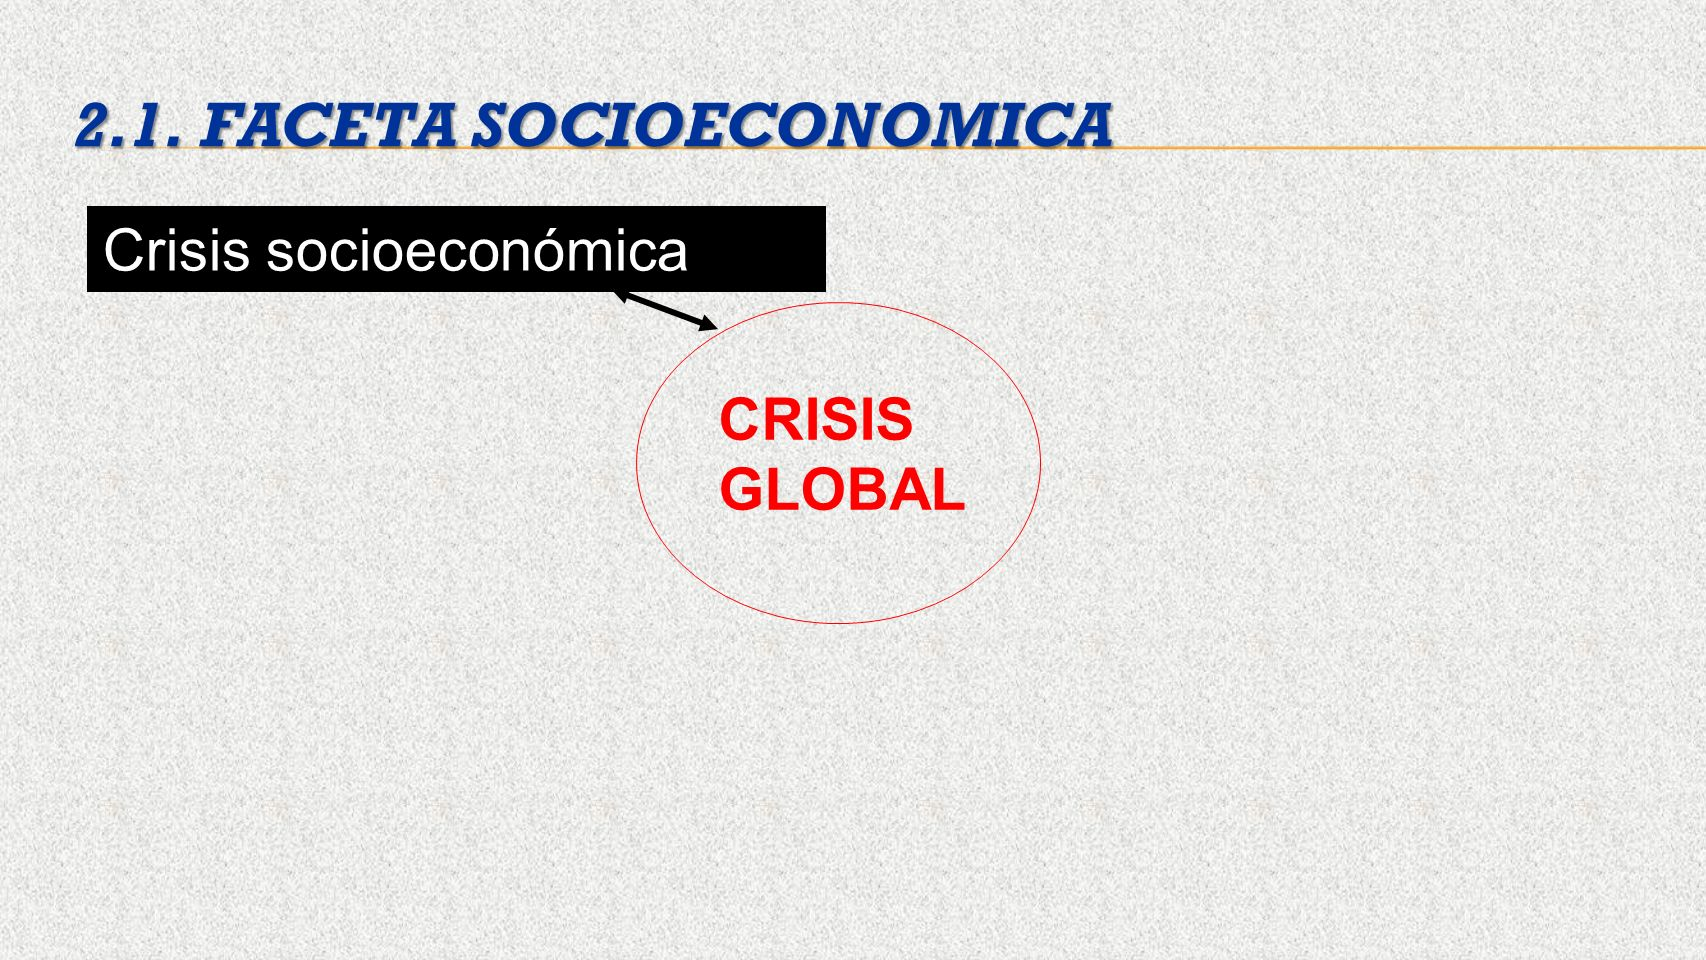 Crisis socioeconómica 2.1. FACETA SOCIOECONOMICA CRISIS GLOBAL